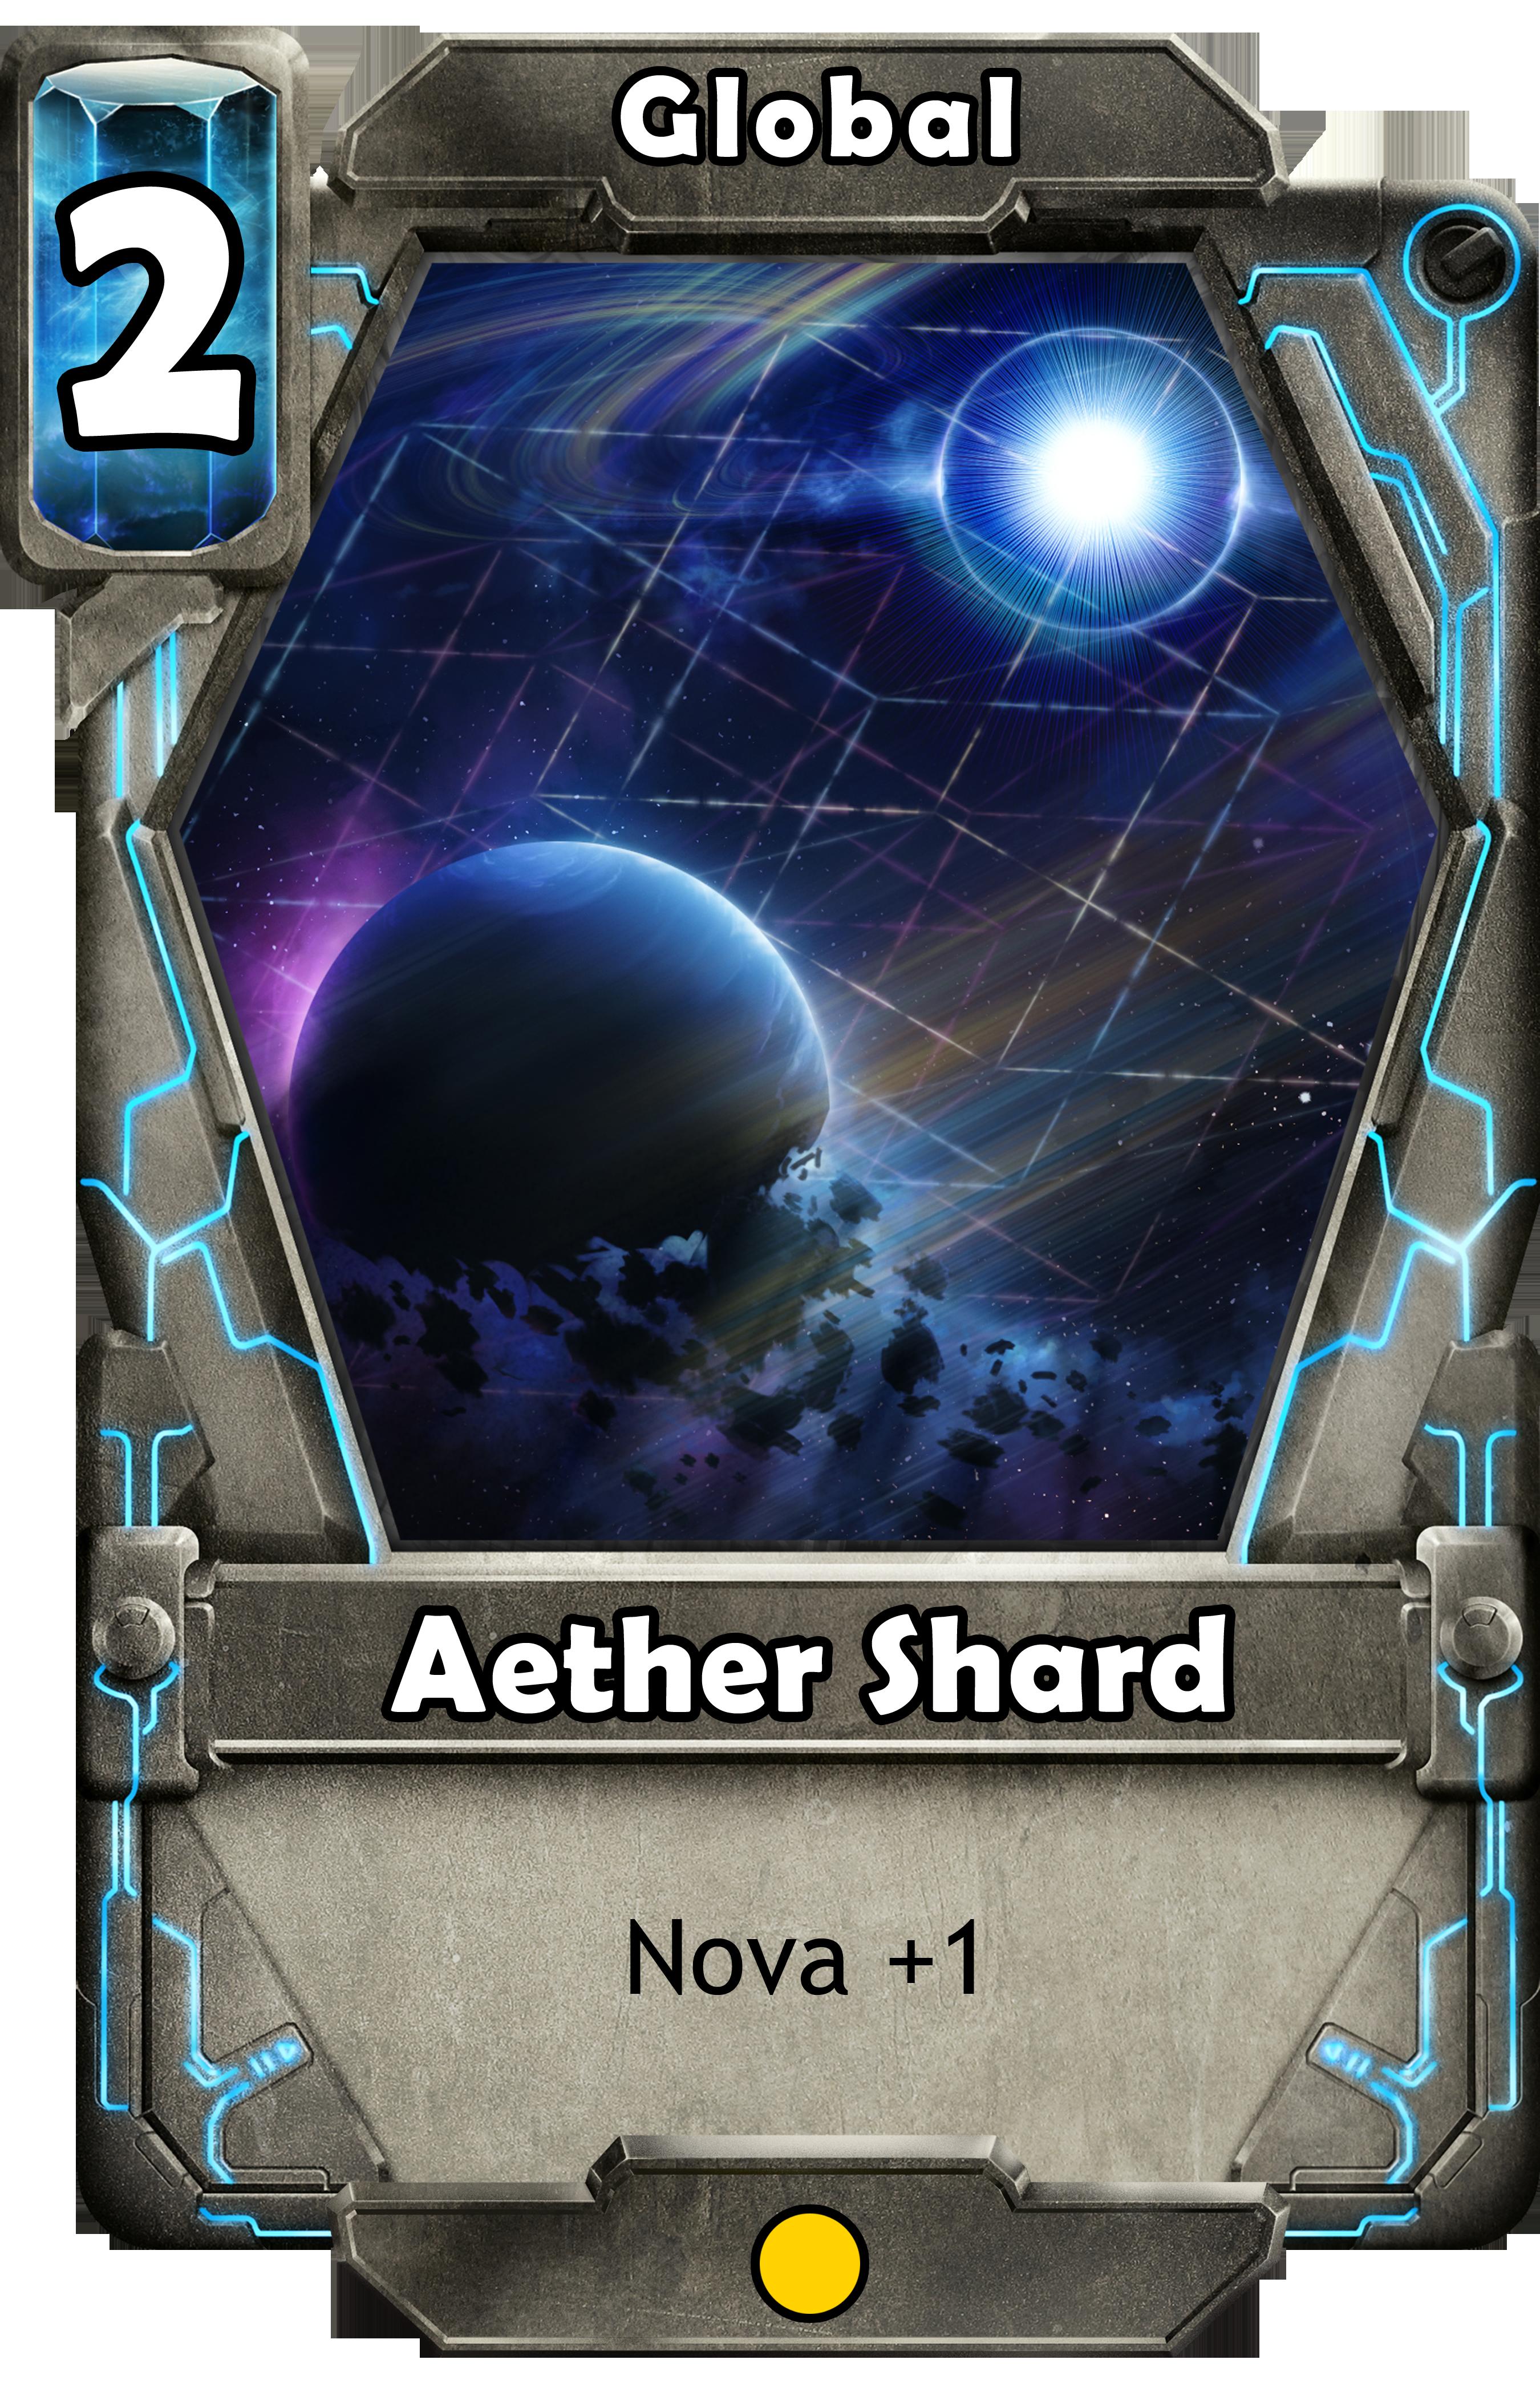 Aether Shard